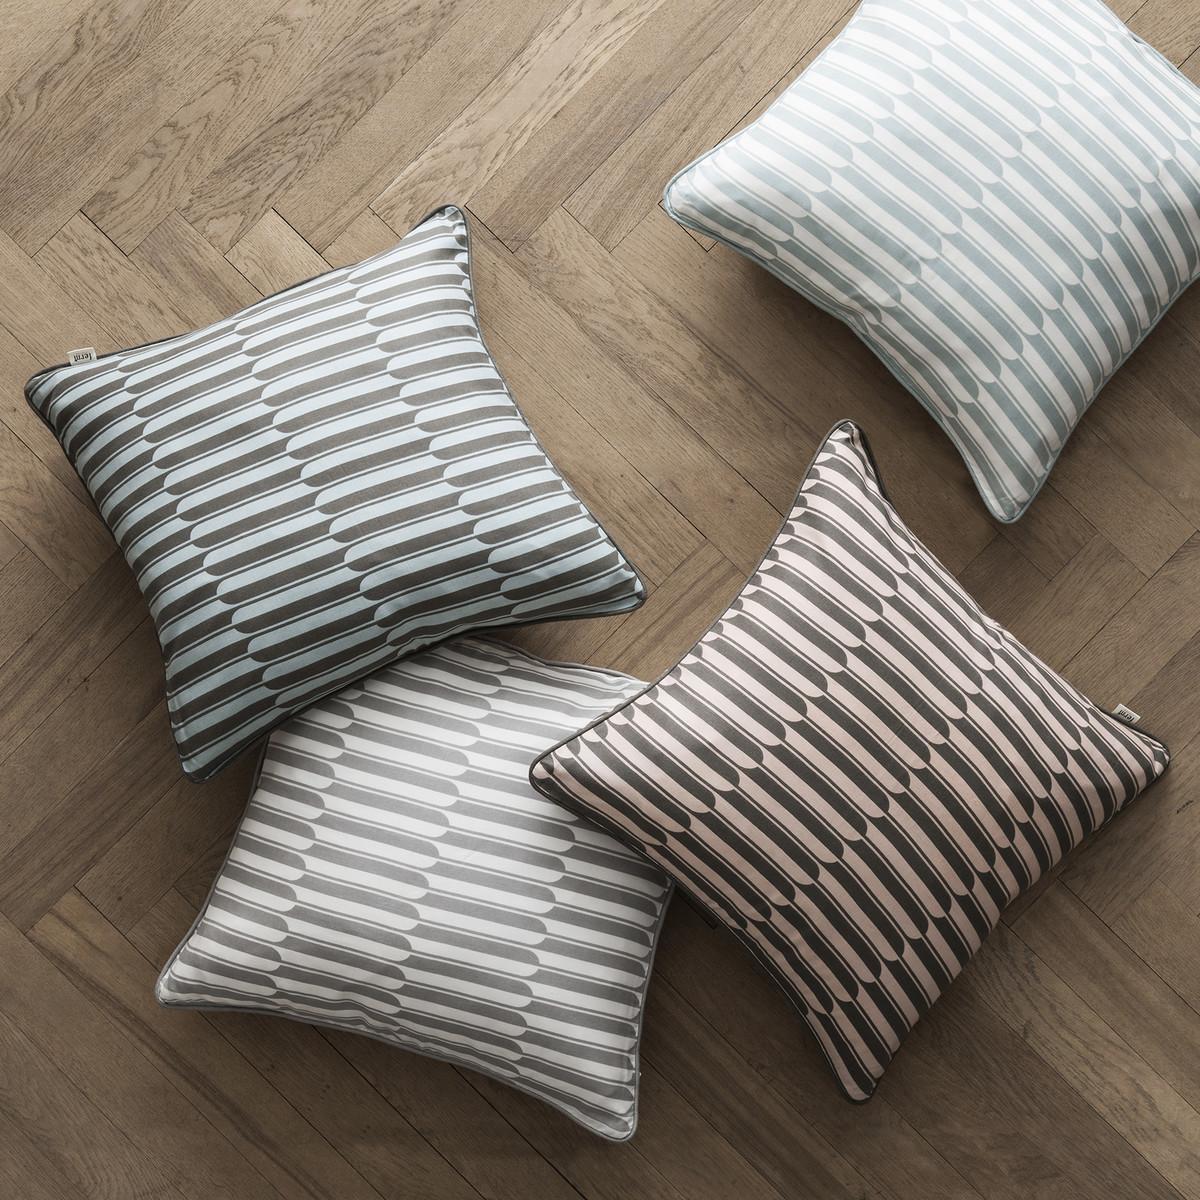 arch kissen von ferm living im shop. Black Bedroom Furniture Sets. Home Design Ideas